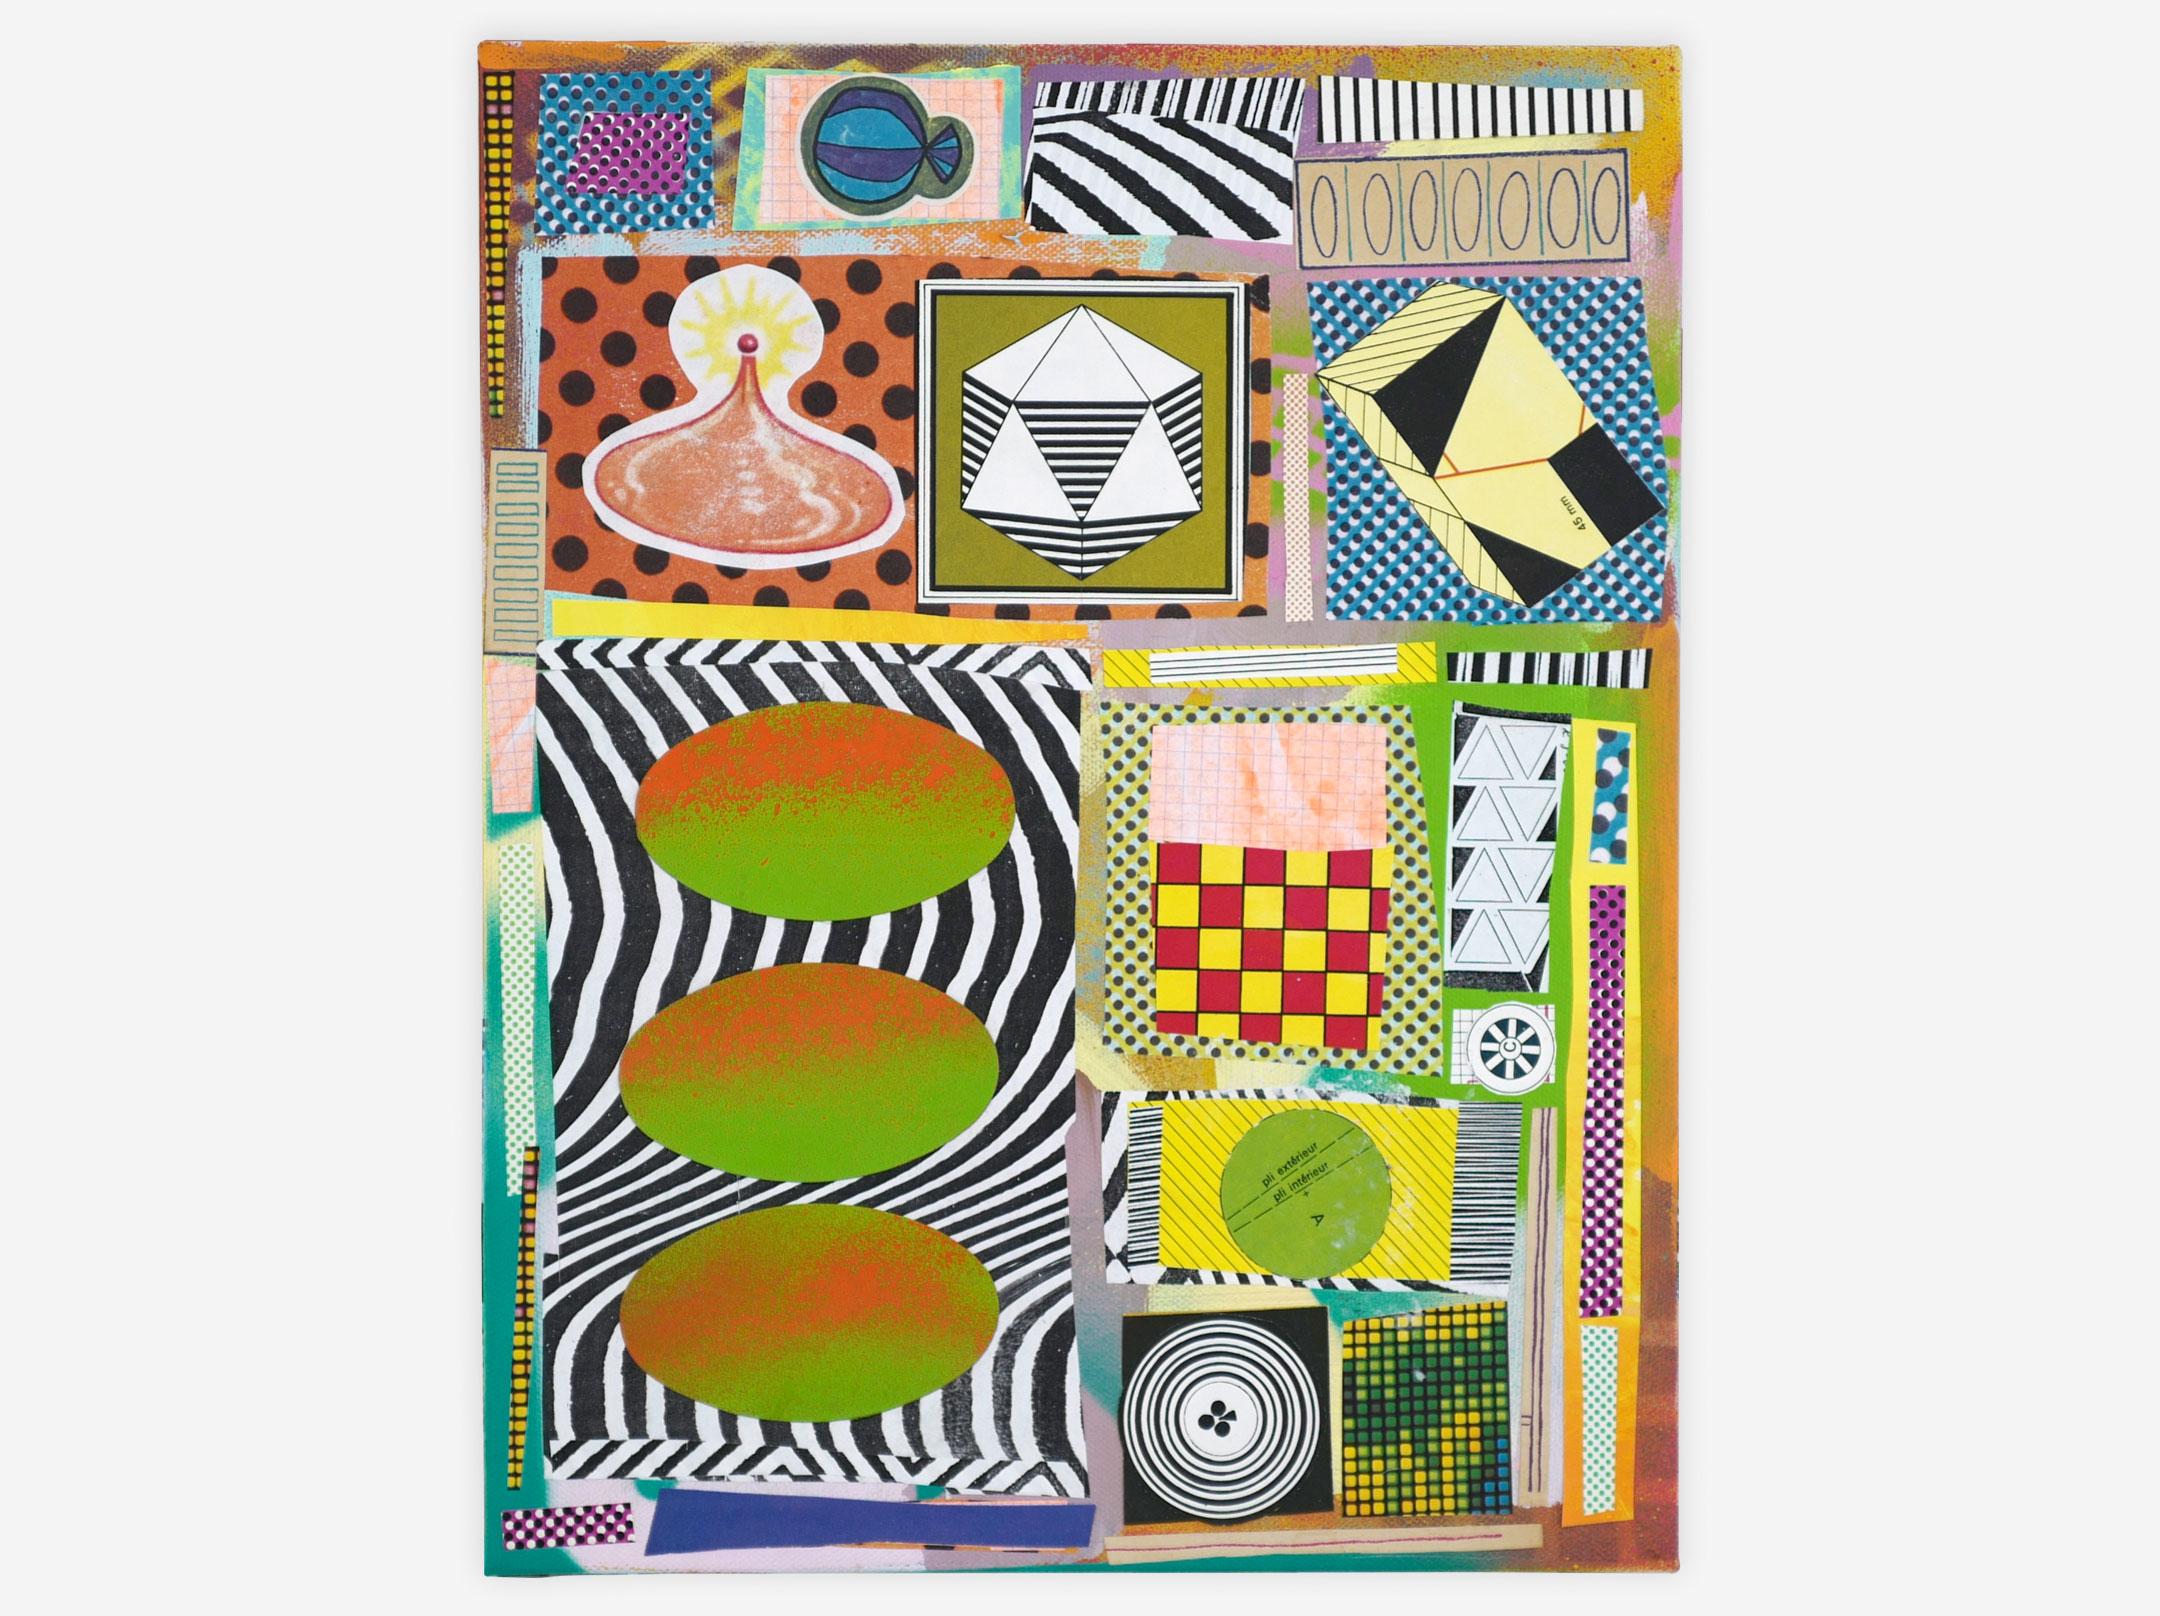 "Strange Fourth Dimension, Mixed Media on Canvas, 11"" x 14"", 2017"